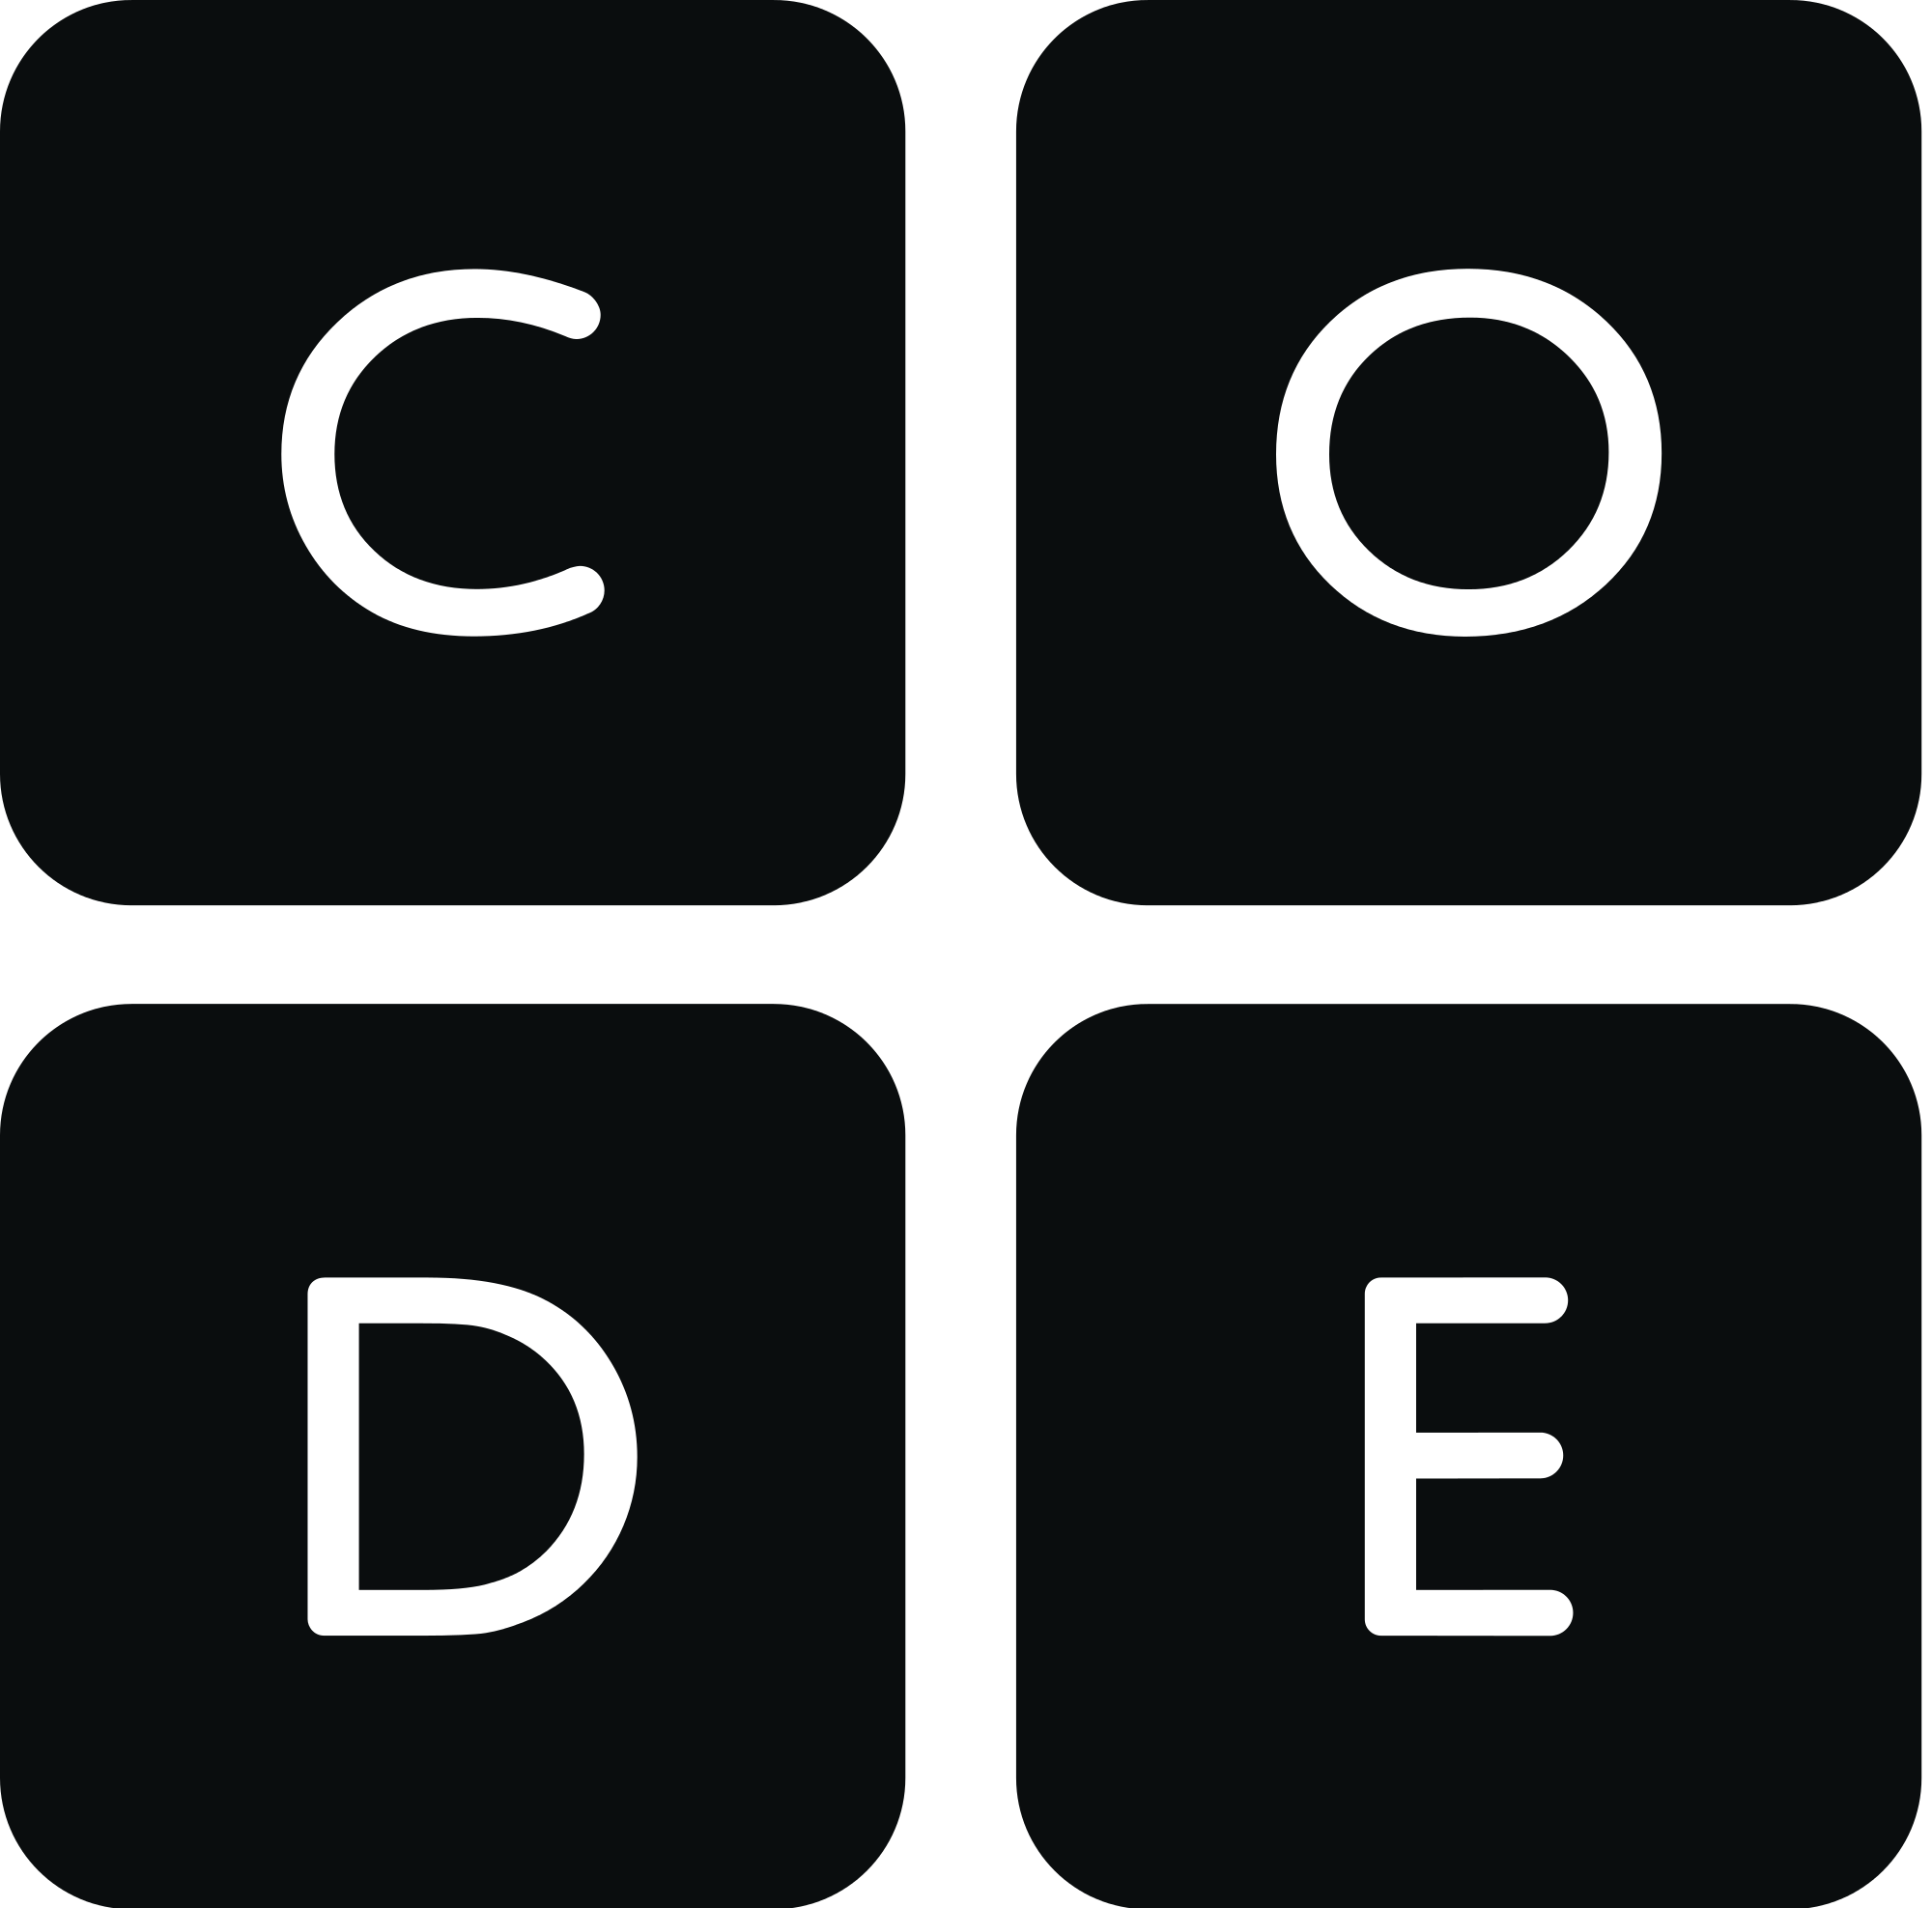 code org logo